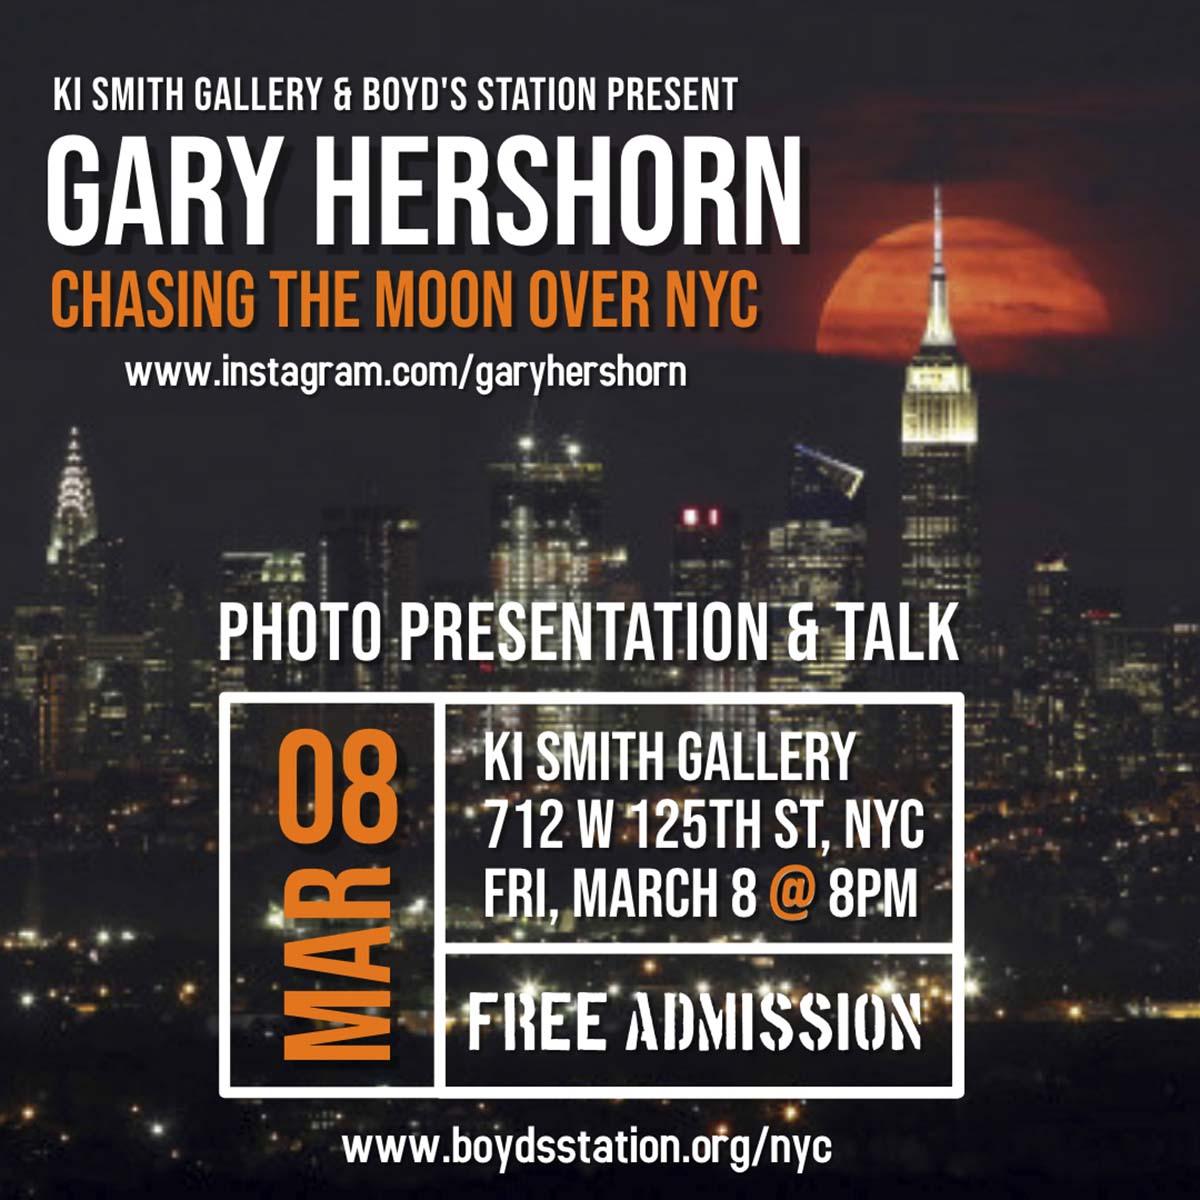 https://www.instagram.com/garyhershorn/?hl=en